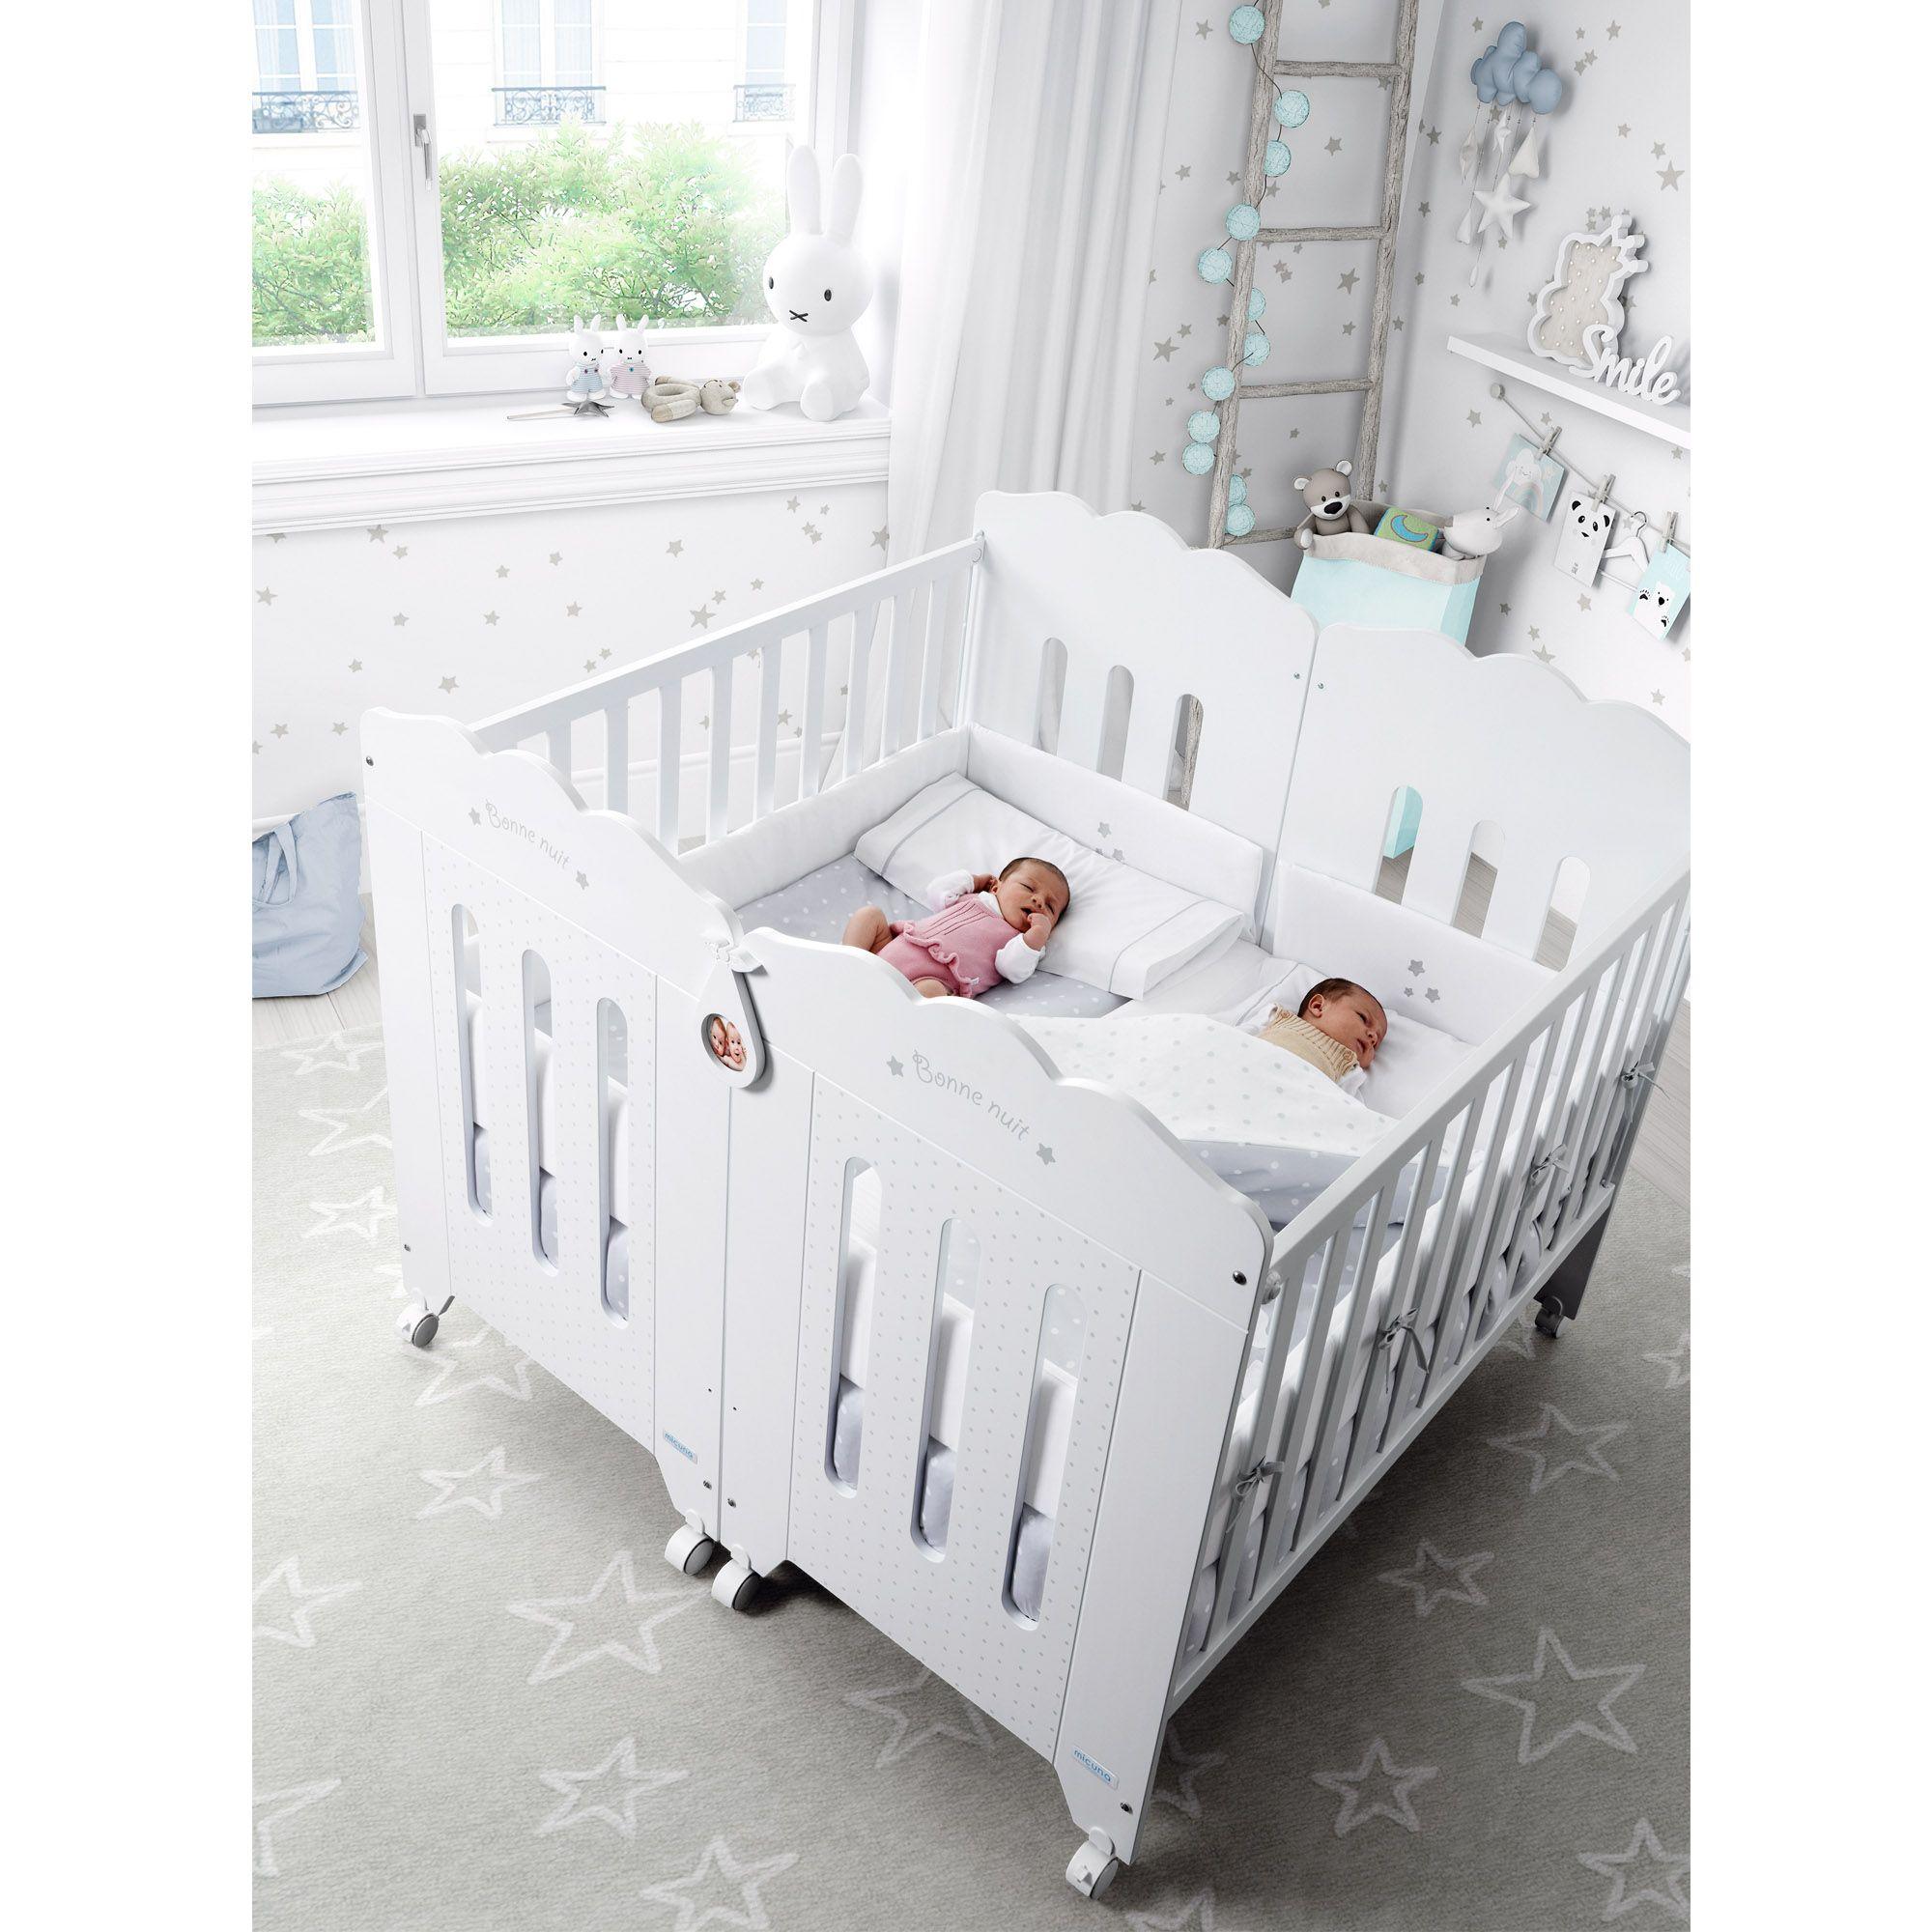 La cuna bonne nuit de 120x60 cm est dise ada y fabricada - Cunas para bebes gemelos ...